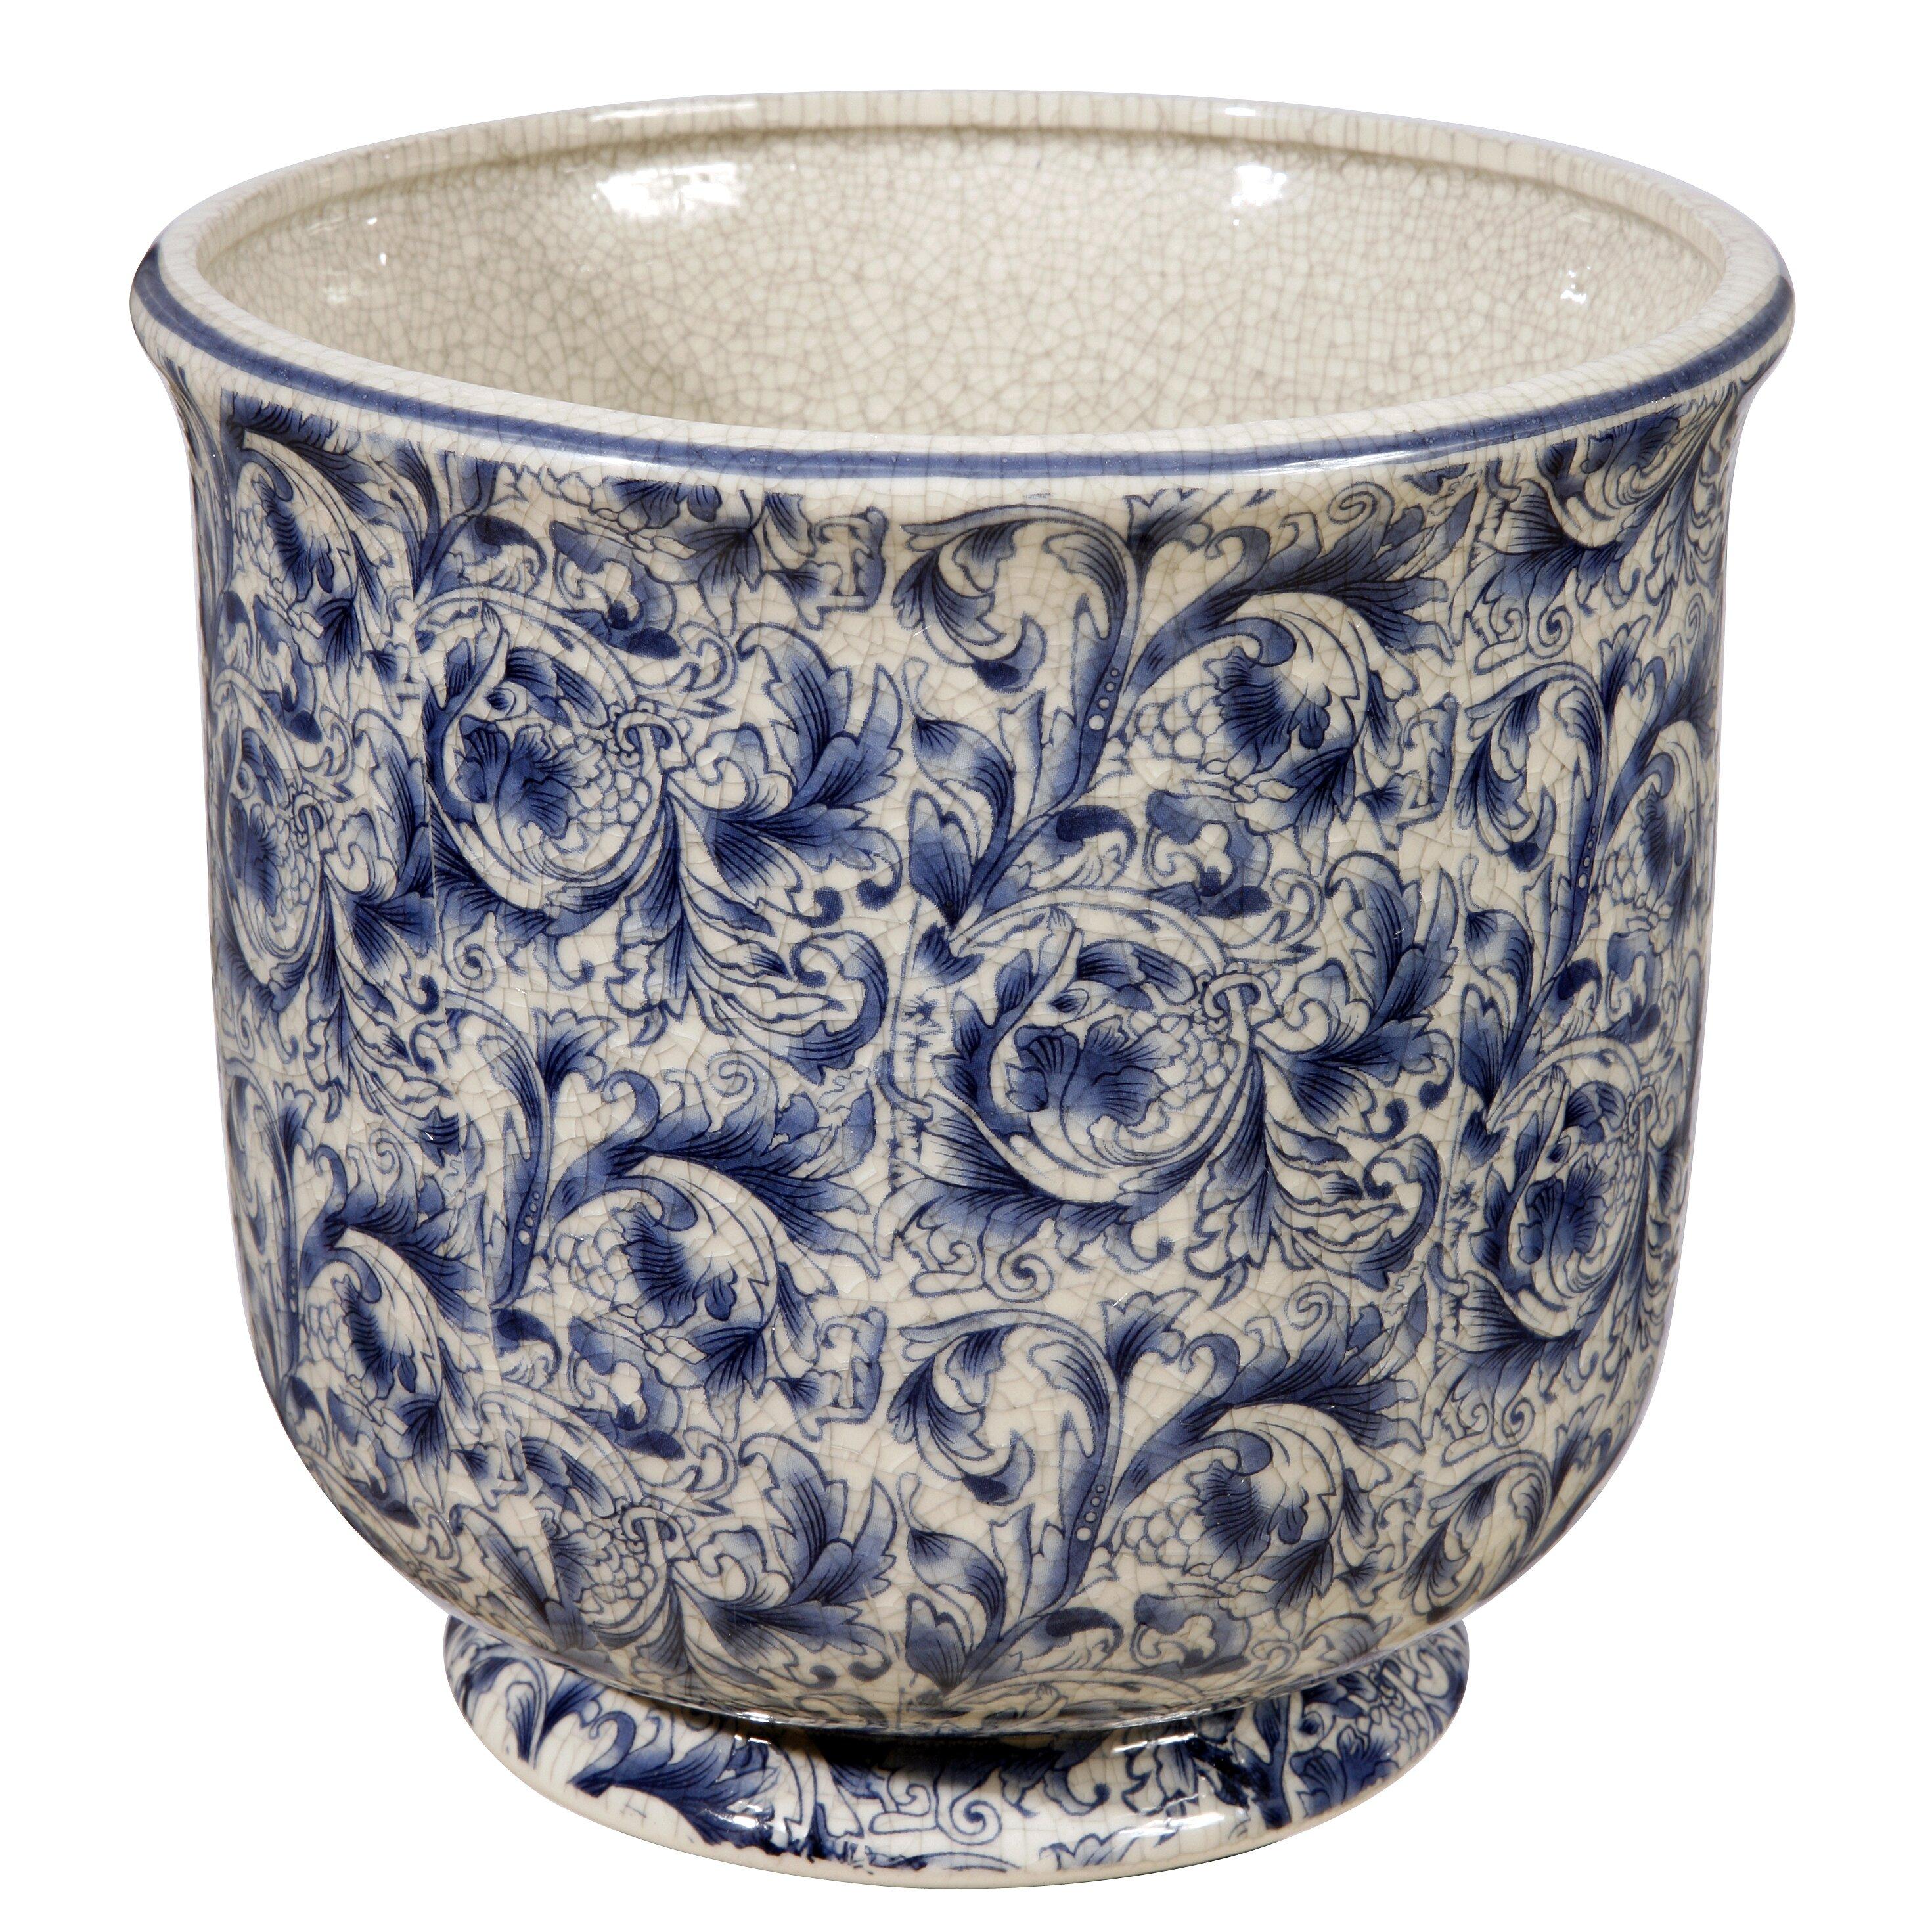 winward designs cache round pot planter reviews wayfair. Black Bedroom Furniture Sets. Home Design Ideas